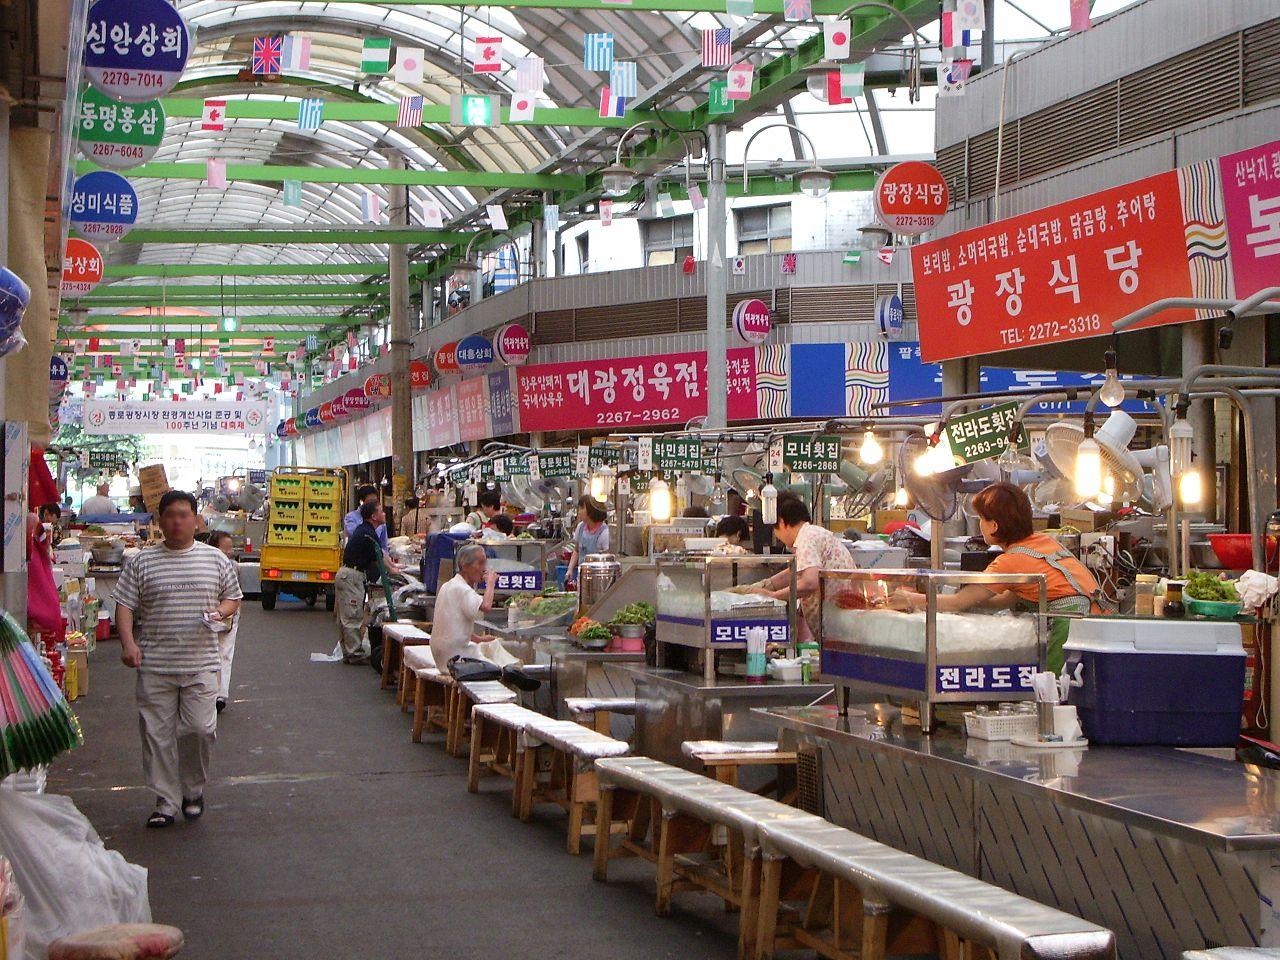 Wholesale Food Store Near Cribbs Causeway